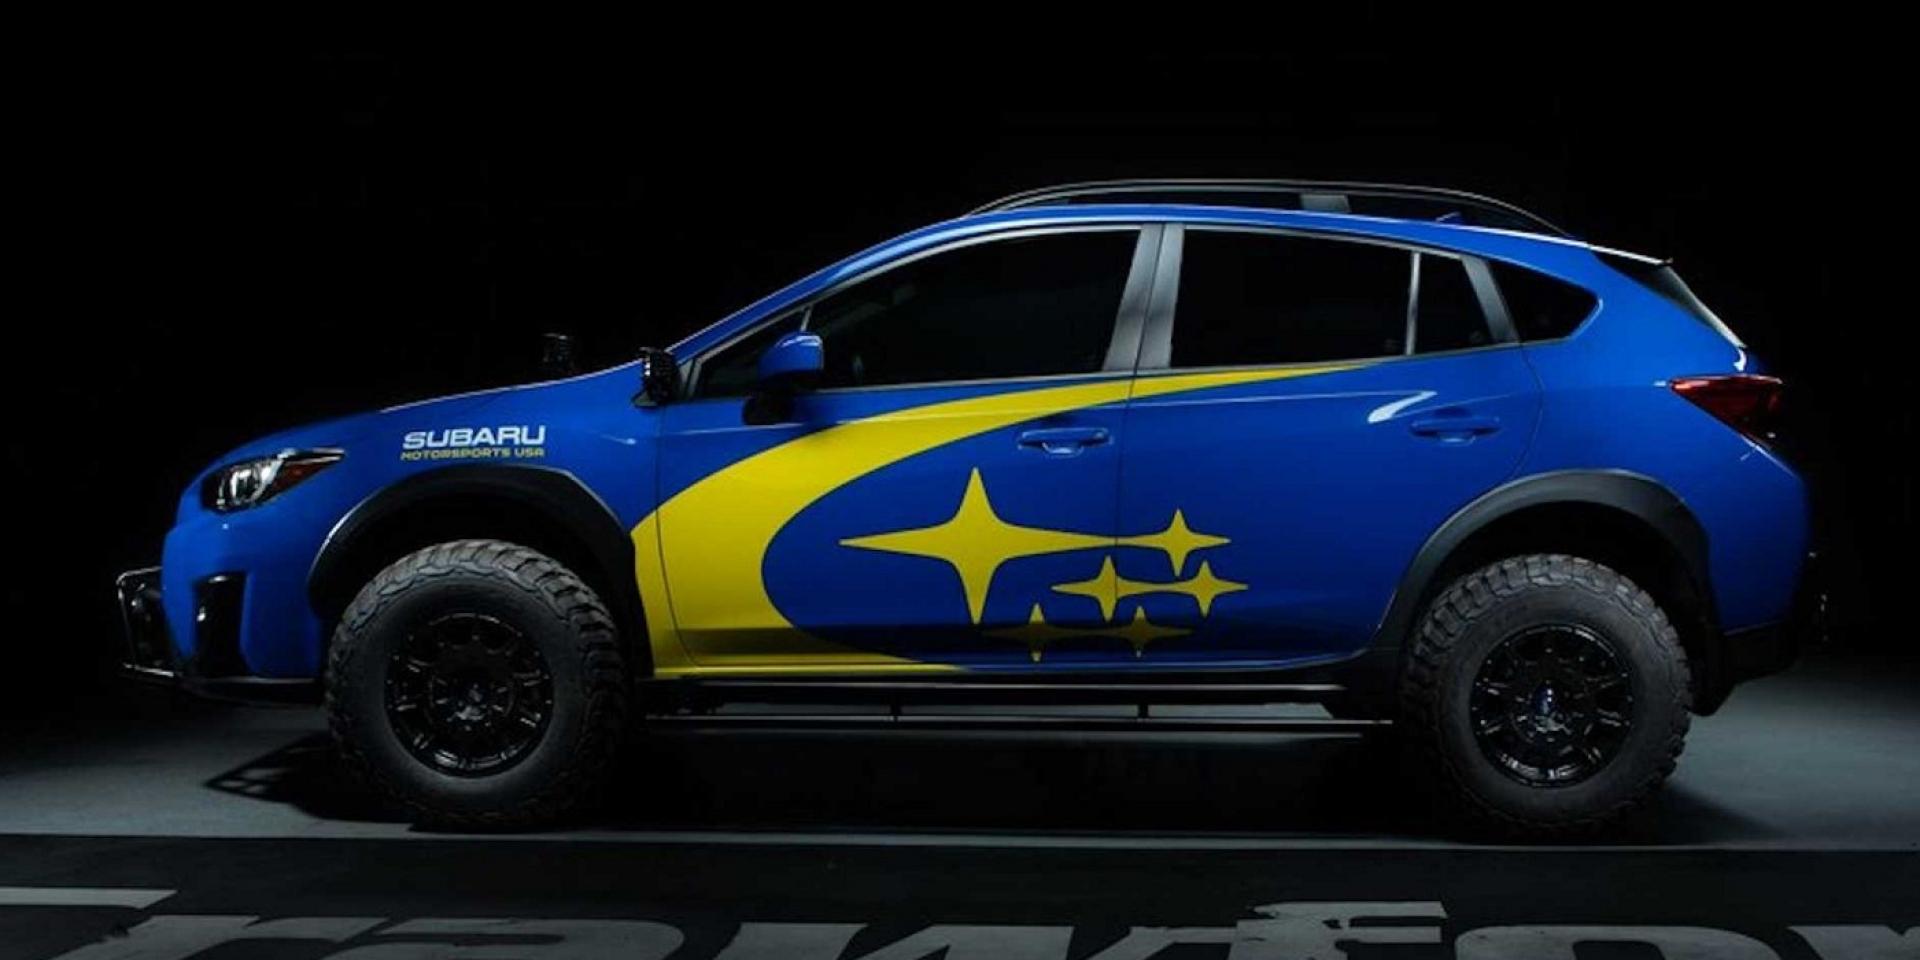 Crawford套件加持,Subaru XV不再簡單